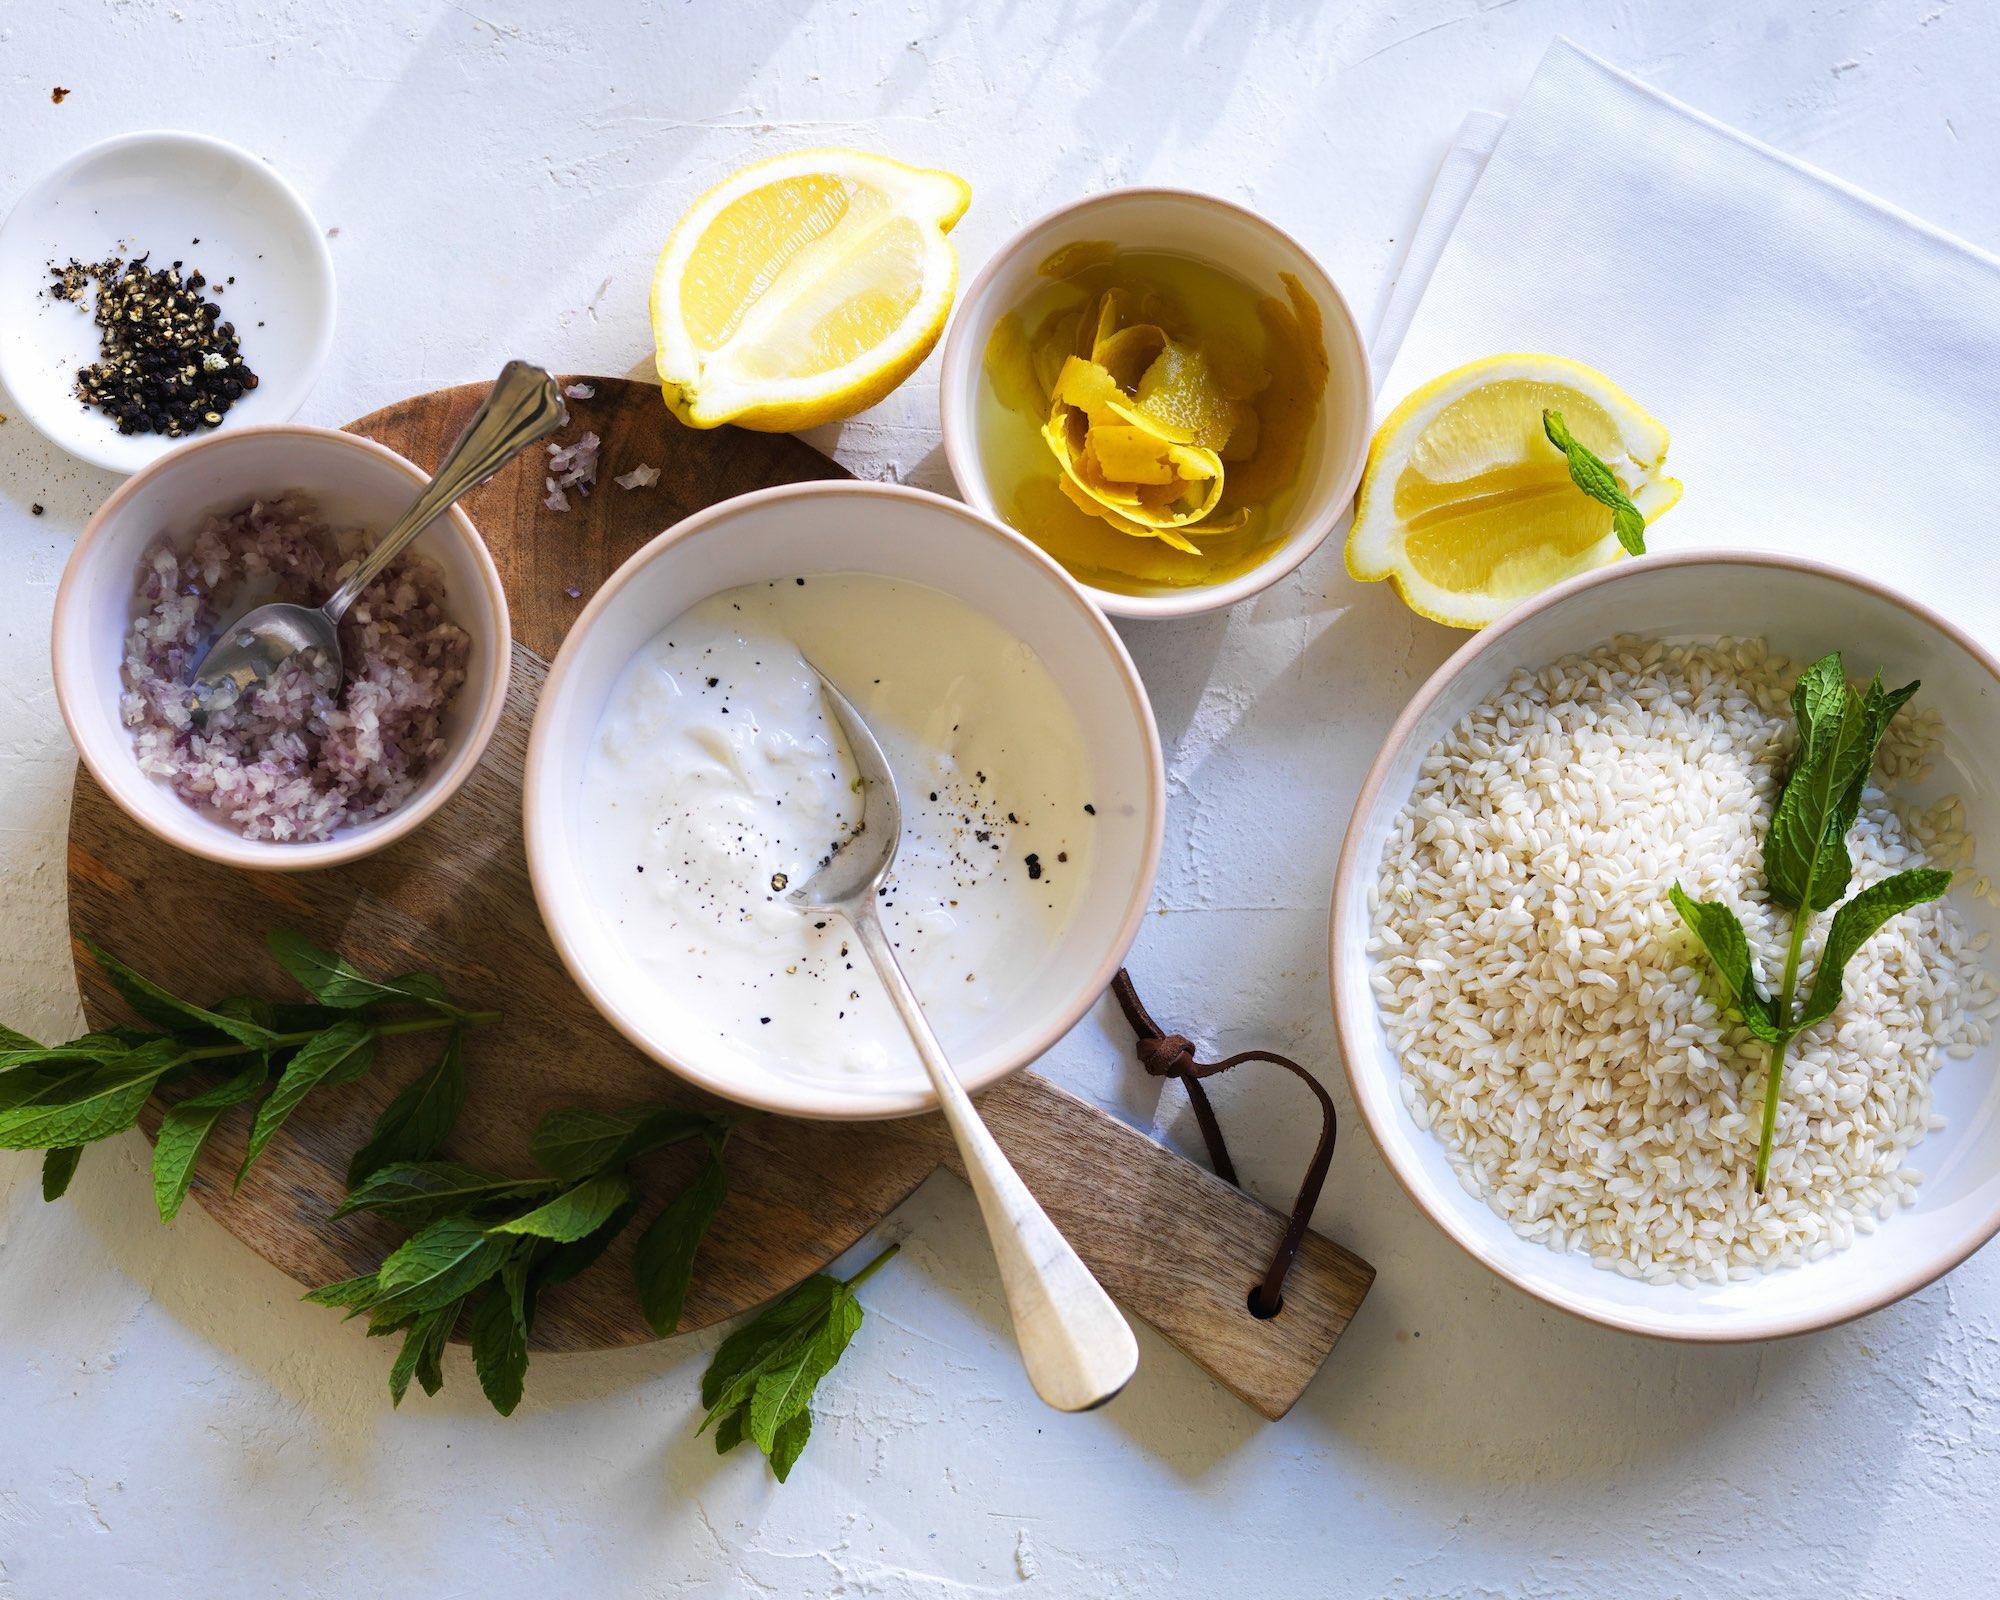 Risotto (in pressure cooker) with Parmesan, stracciatella, lemon and mint